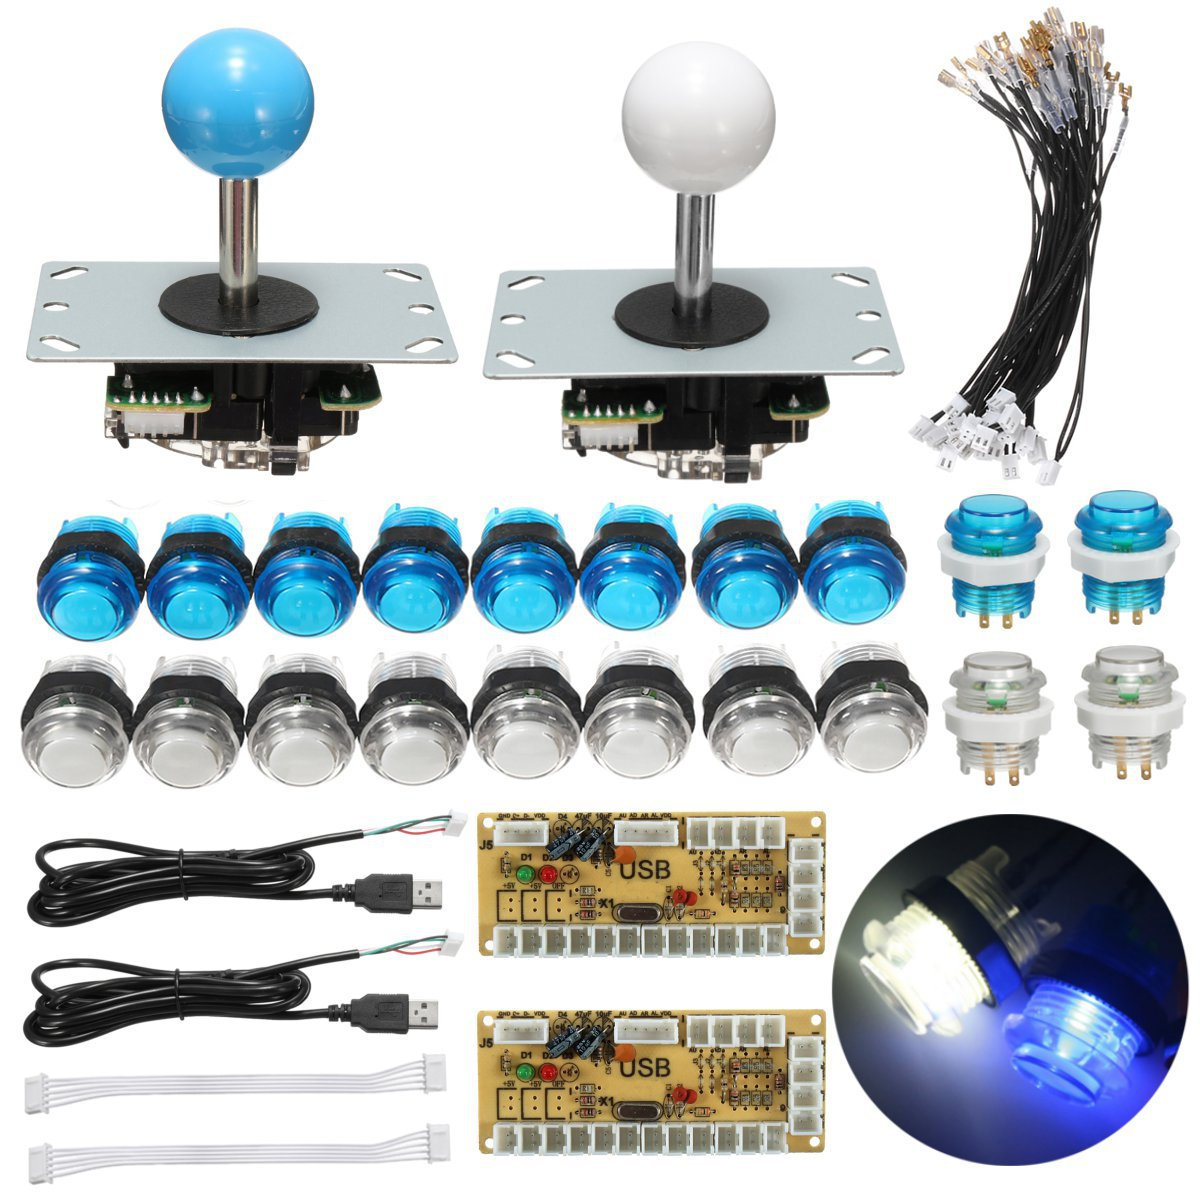 Zéro Retard Joystick Arcade DIY Kit LED Push Bouton + Joystick + USB Codeur + Fil Harnais USB Contrôleur Pour arcade Mame Jeu D'arcade